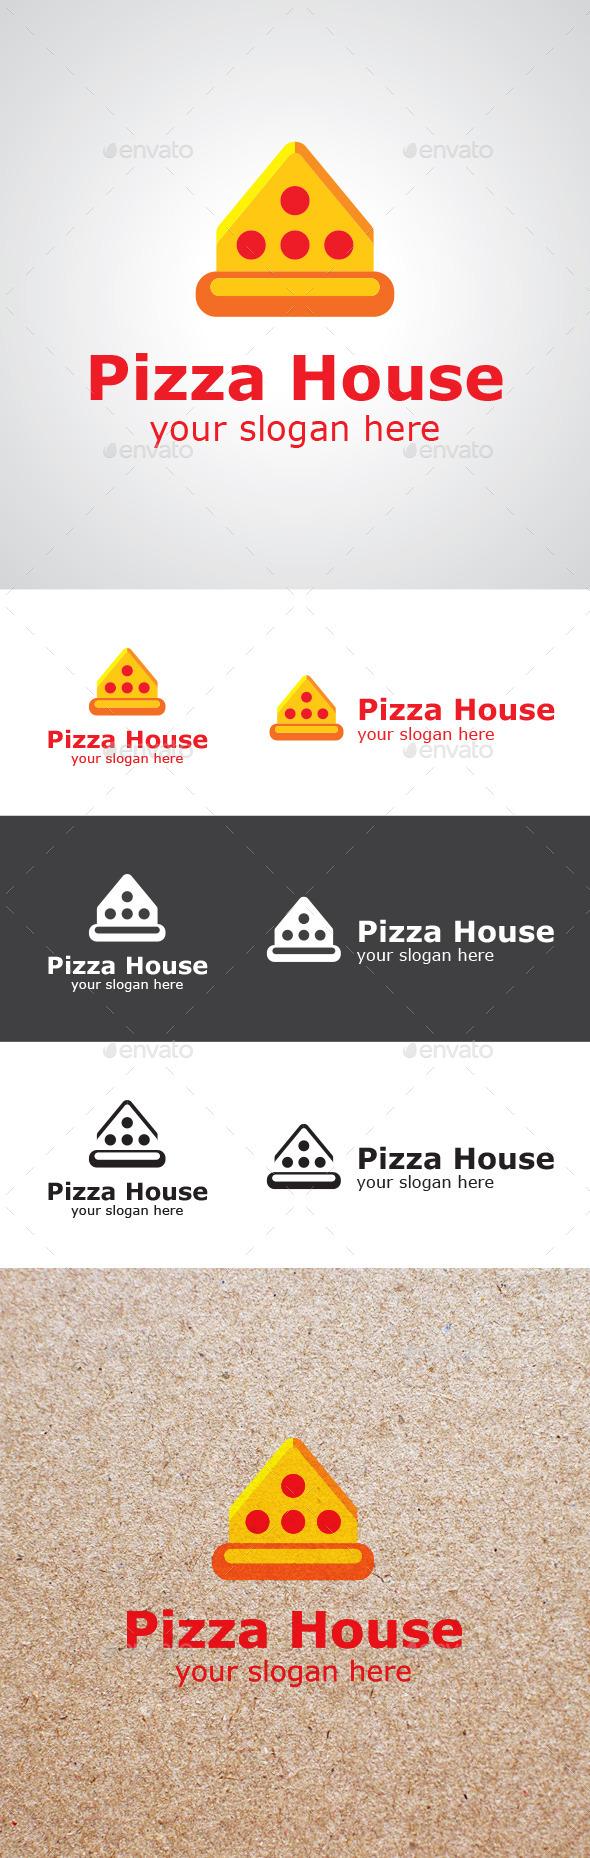 Pizza House Logo Design - Food Logo Templates